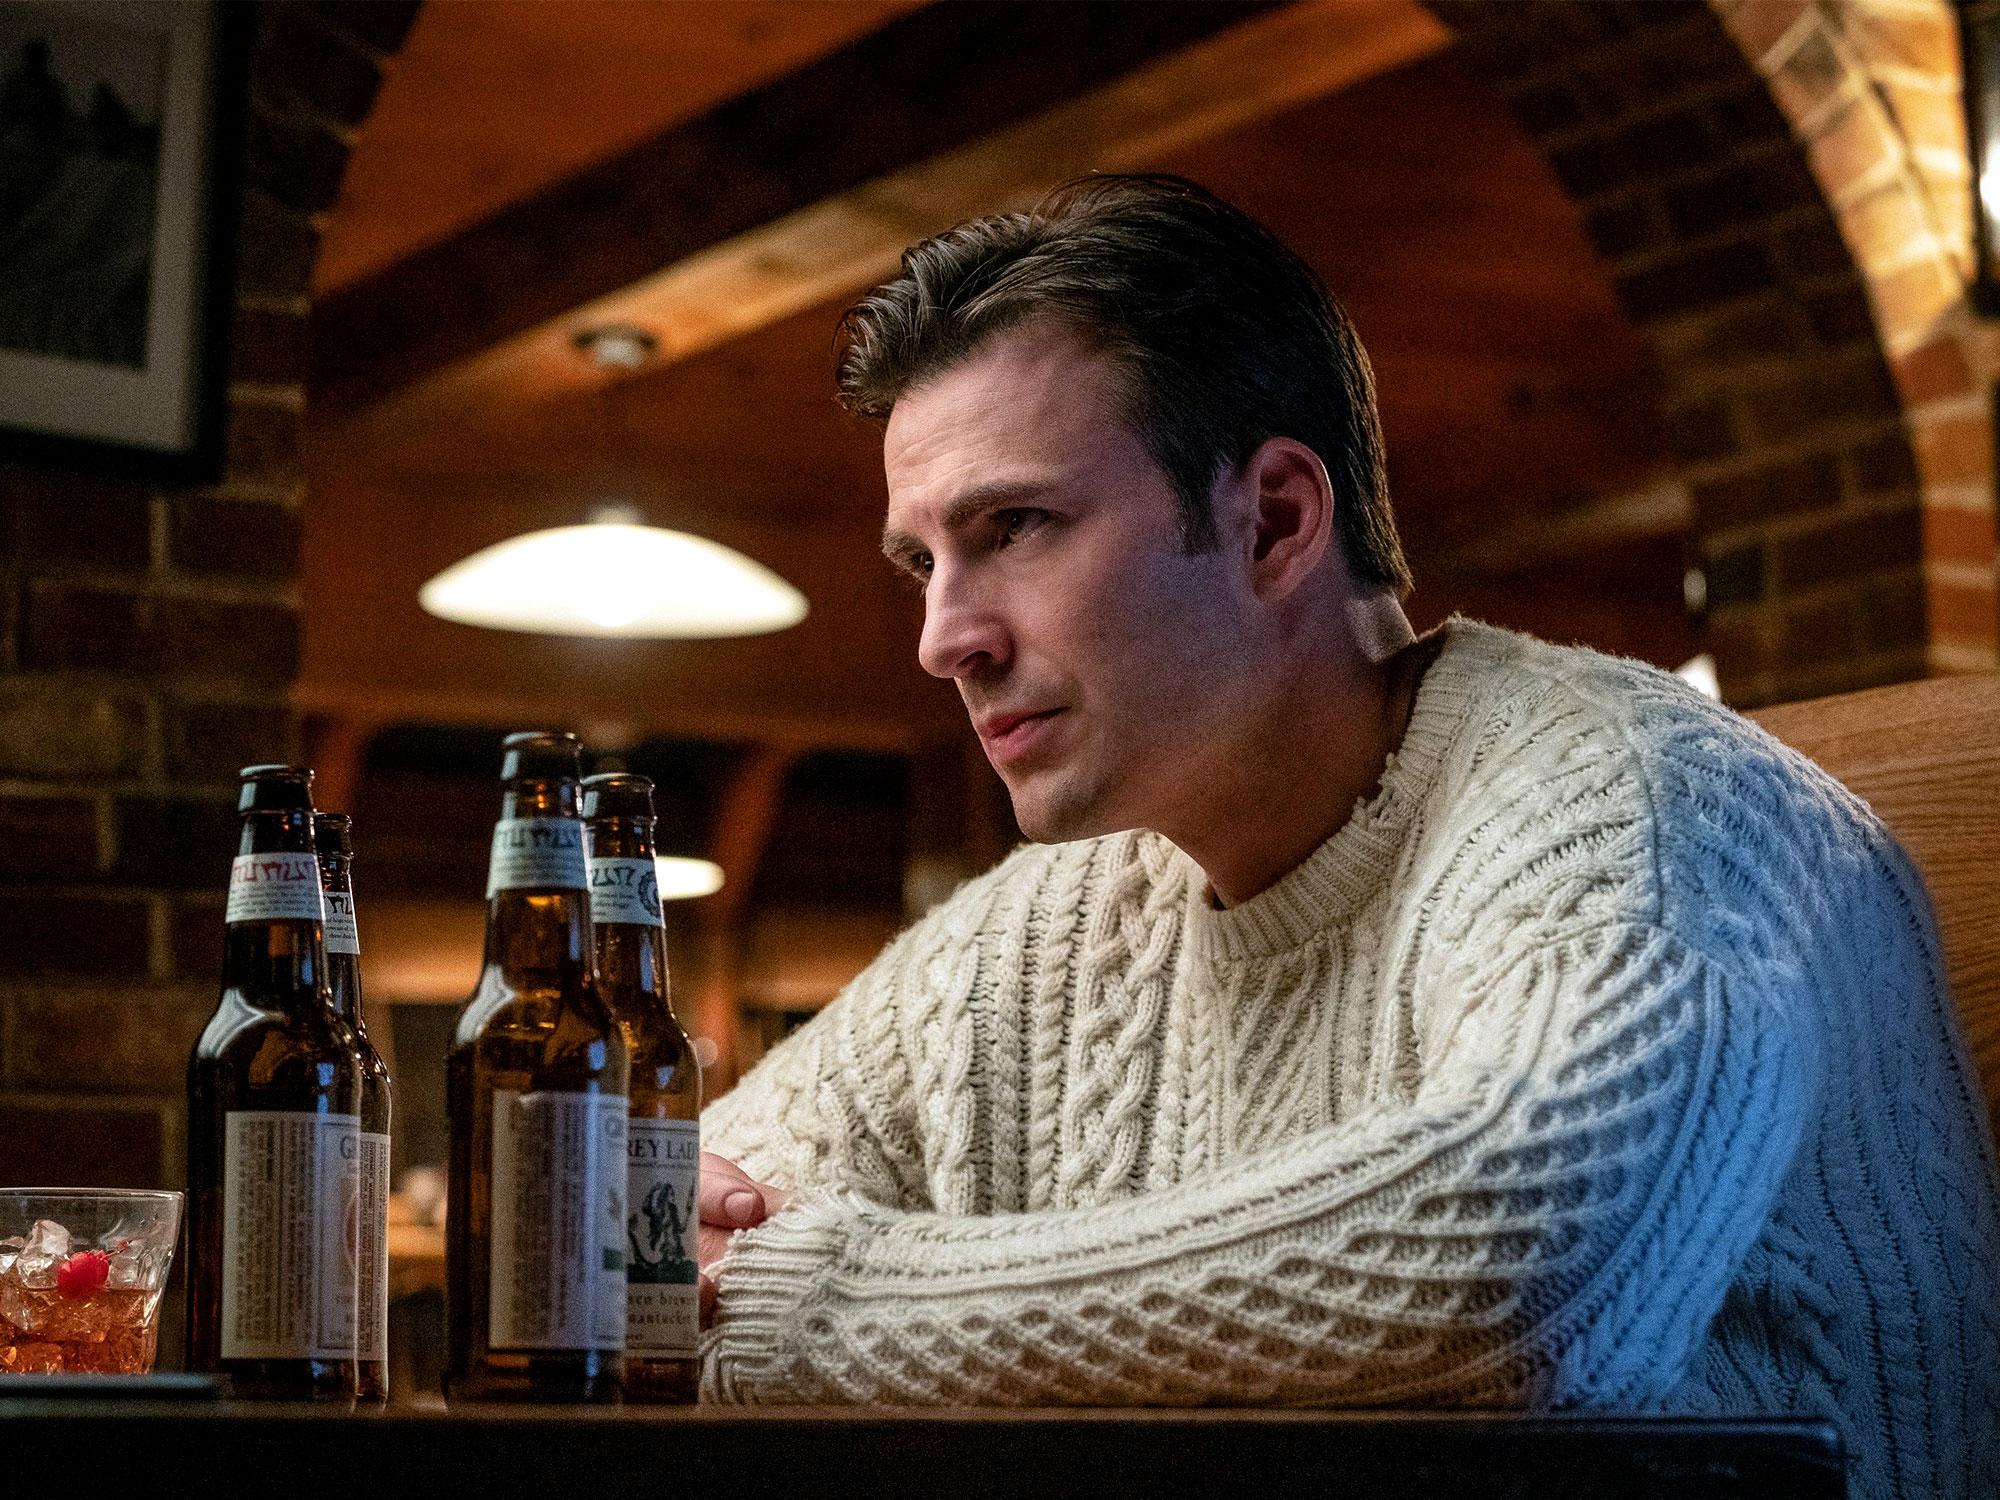 A new Little Shop of Horrors remake ensnares Chris Evans